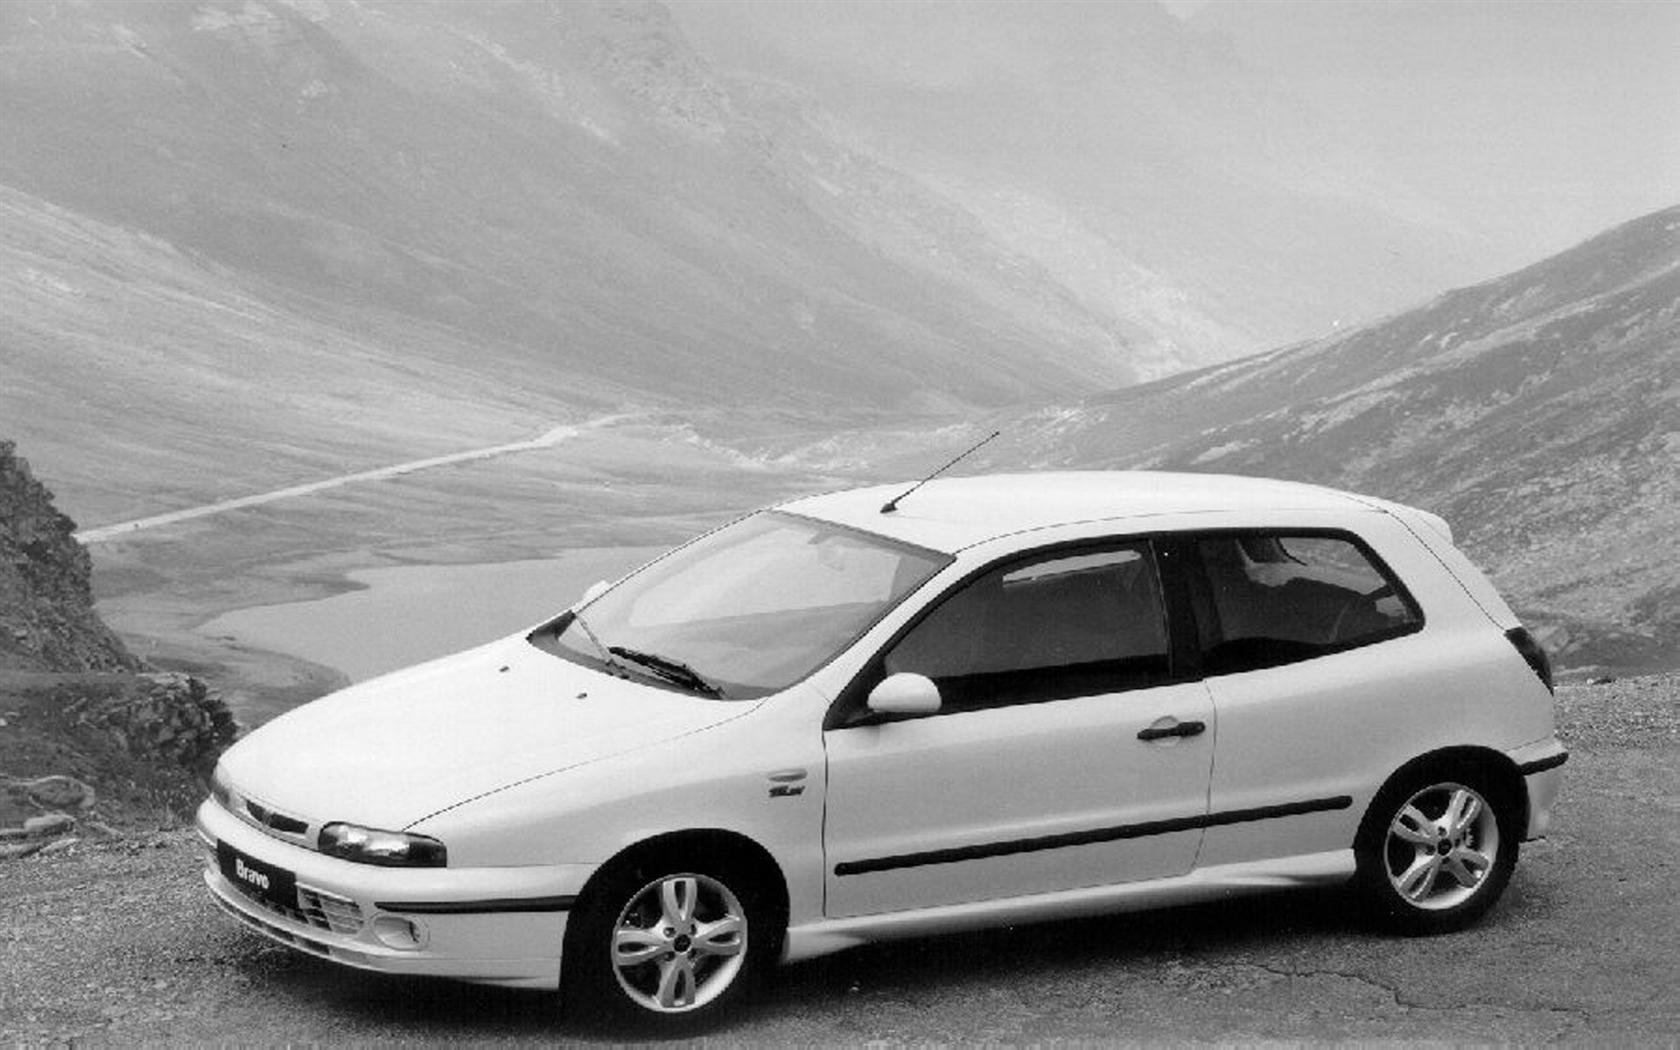 2001 Fiat Bravo Image Https Www Conceptcarz Com Images